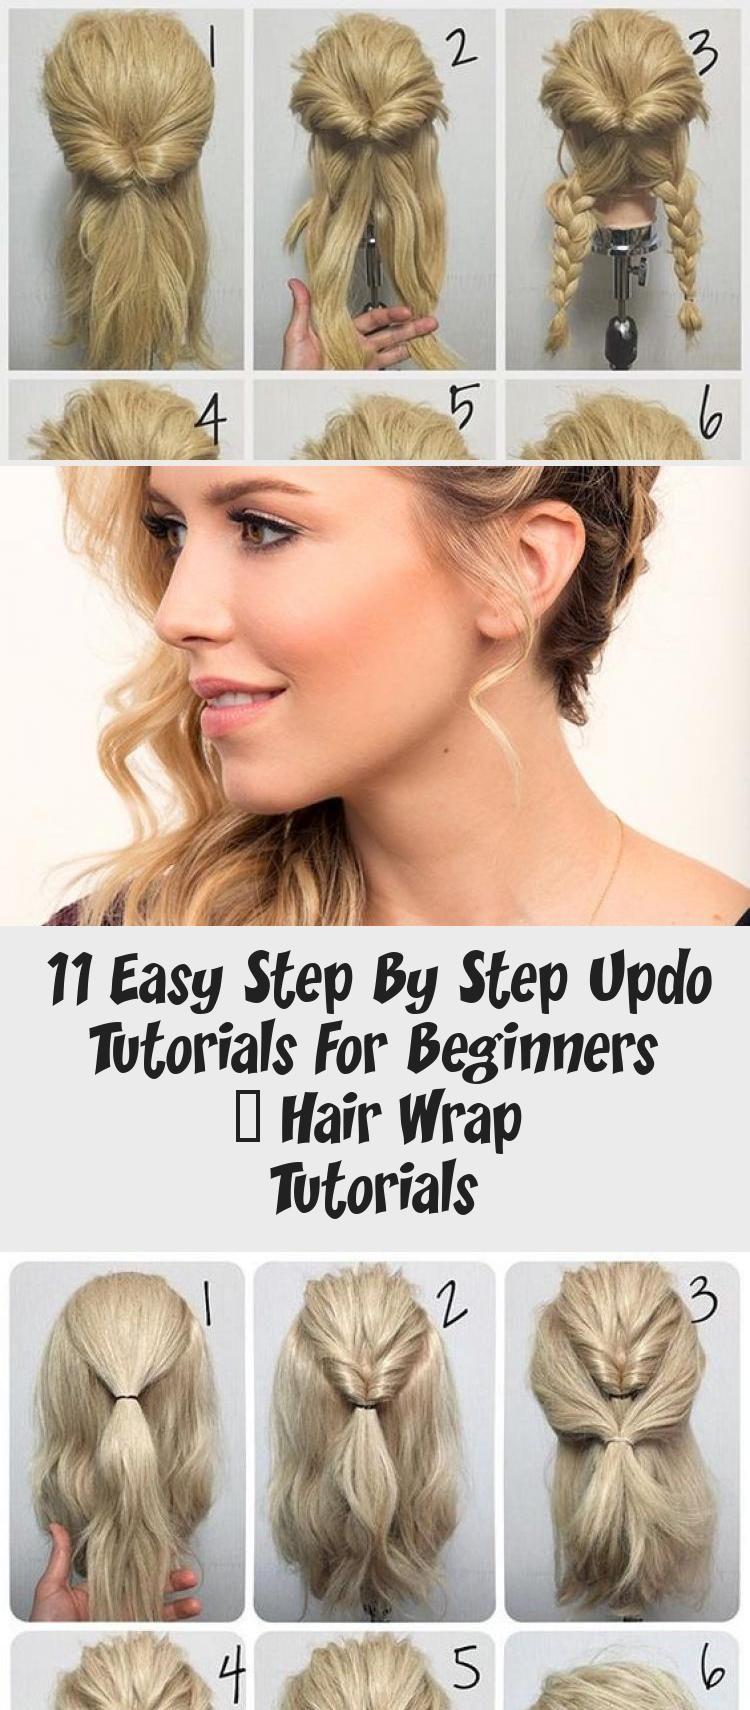 Step By Step Hair Tutorials 1920shairtutorial Hairtutorialblackwomen Longhairtutorial Hairtutorialquic In 2020 Hair Tutorial Quick Long Hair Tutorial Updo Tutorial